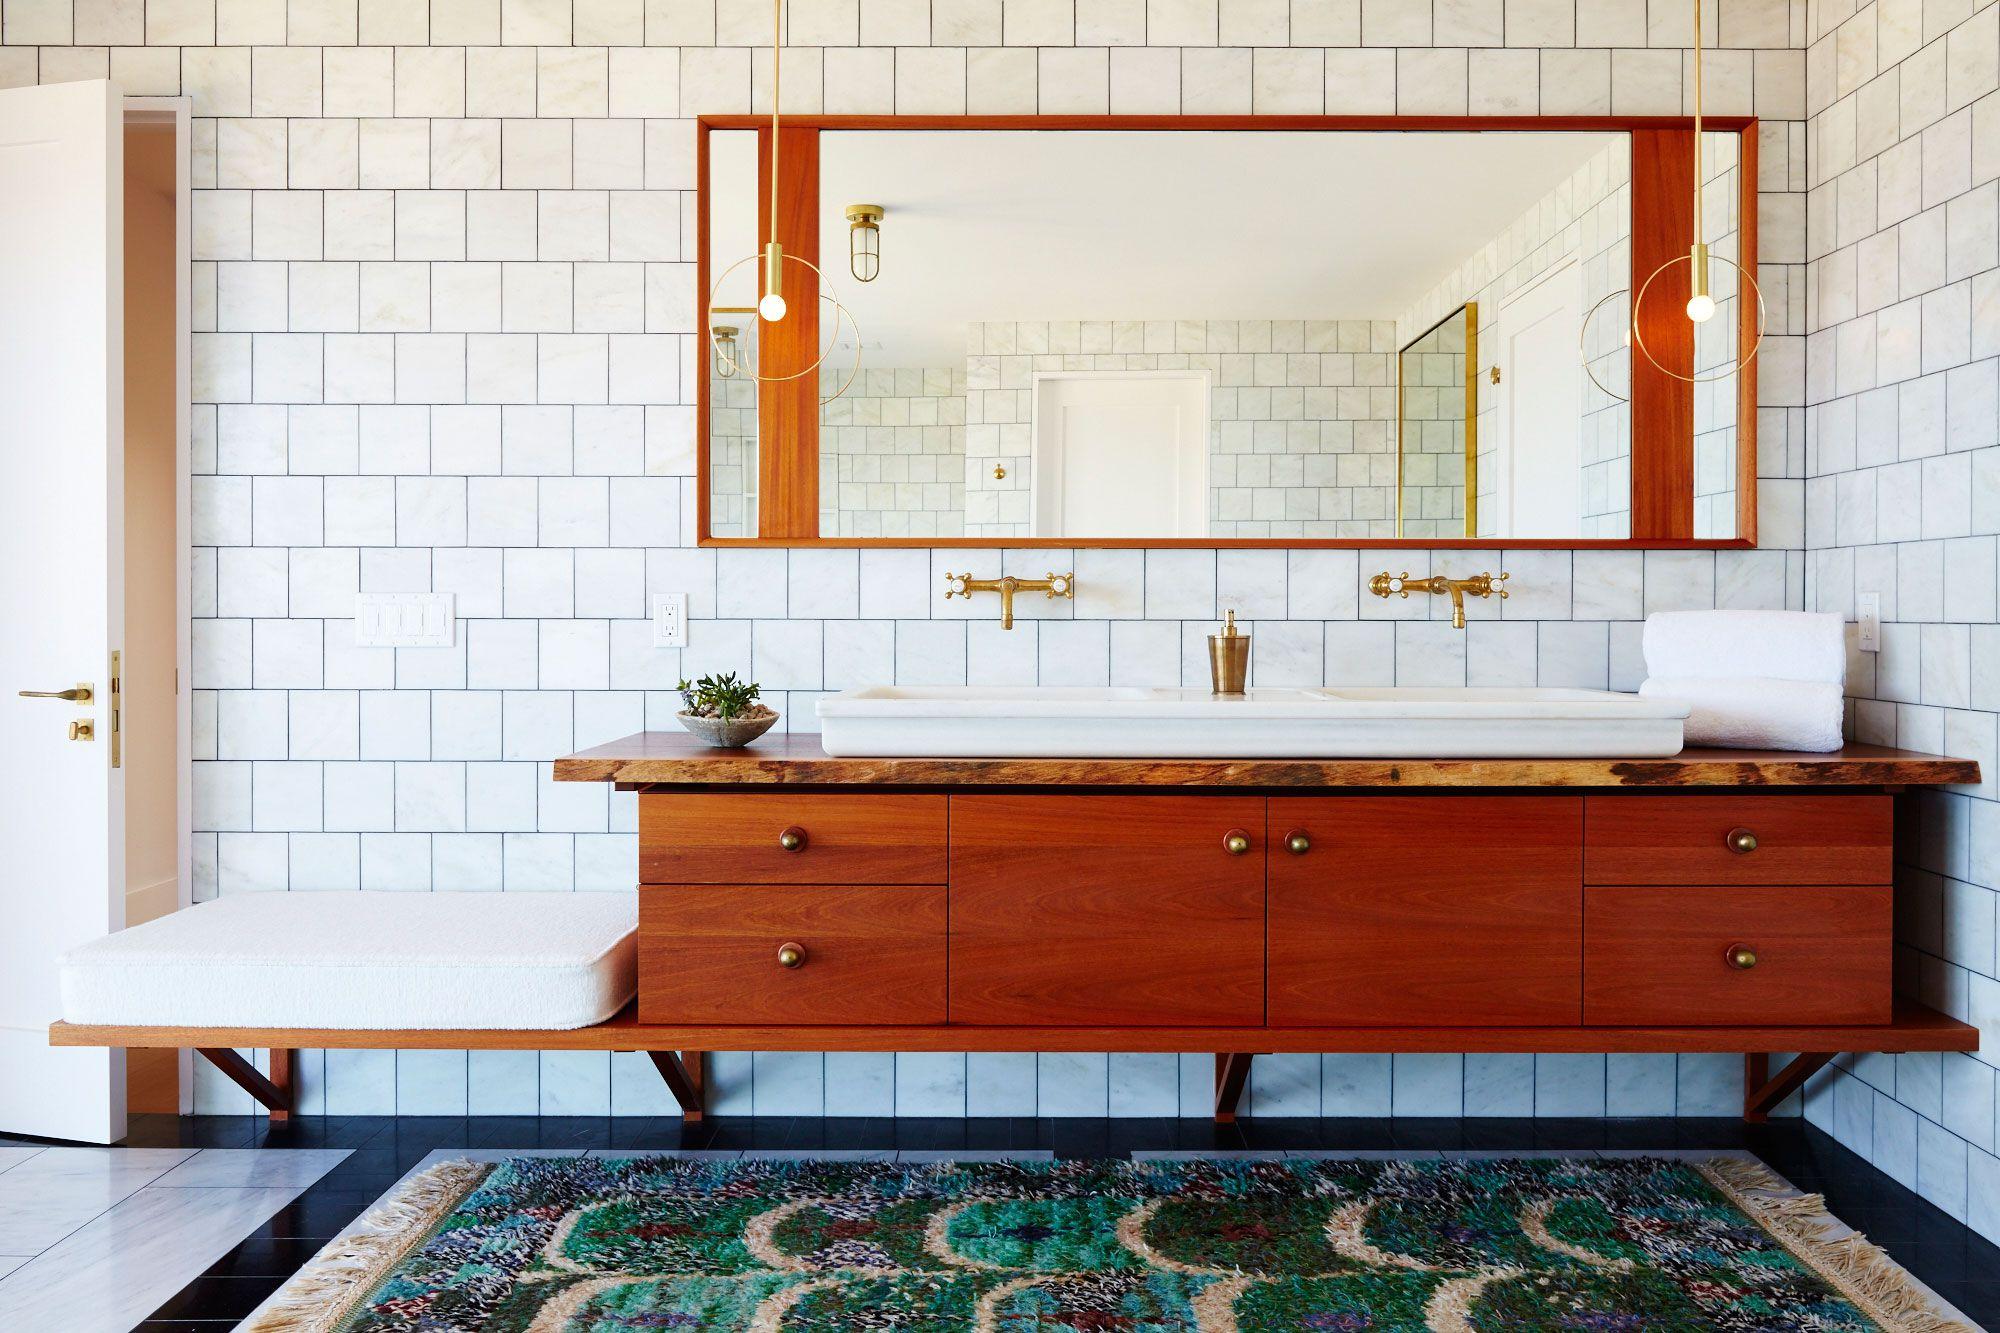 60+ Best Bathroom Designs - Photos of Beautiful Bathroom Ideas to Try